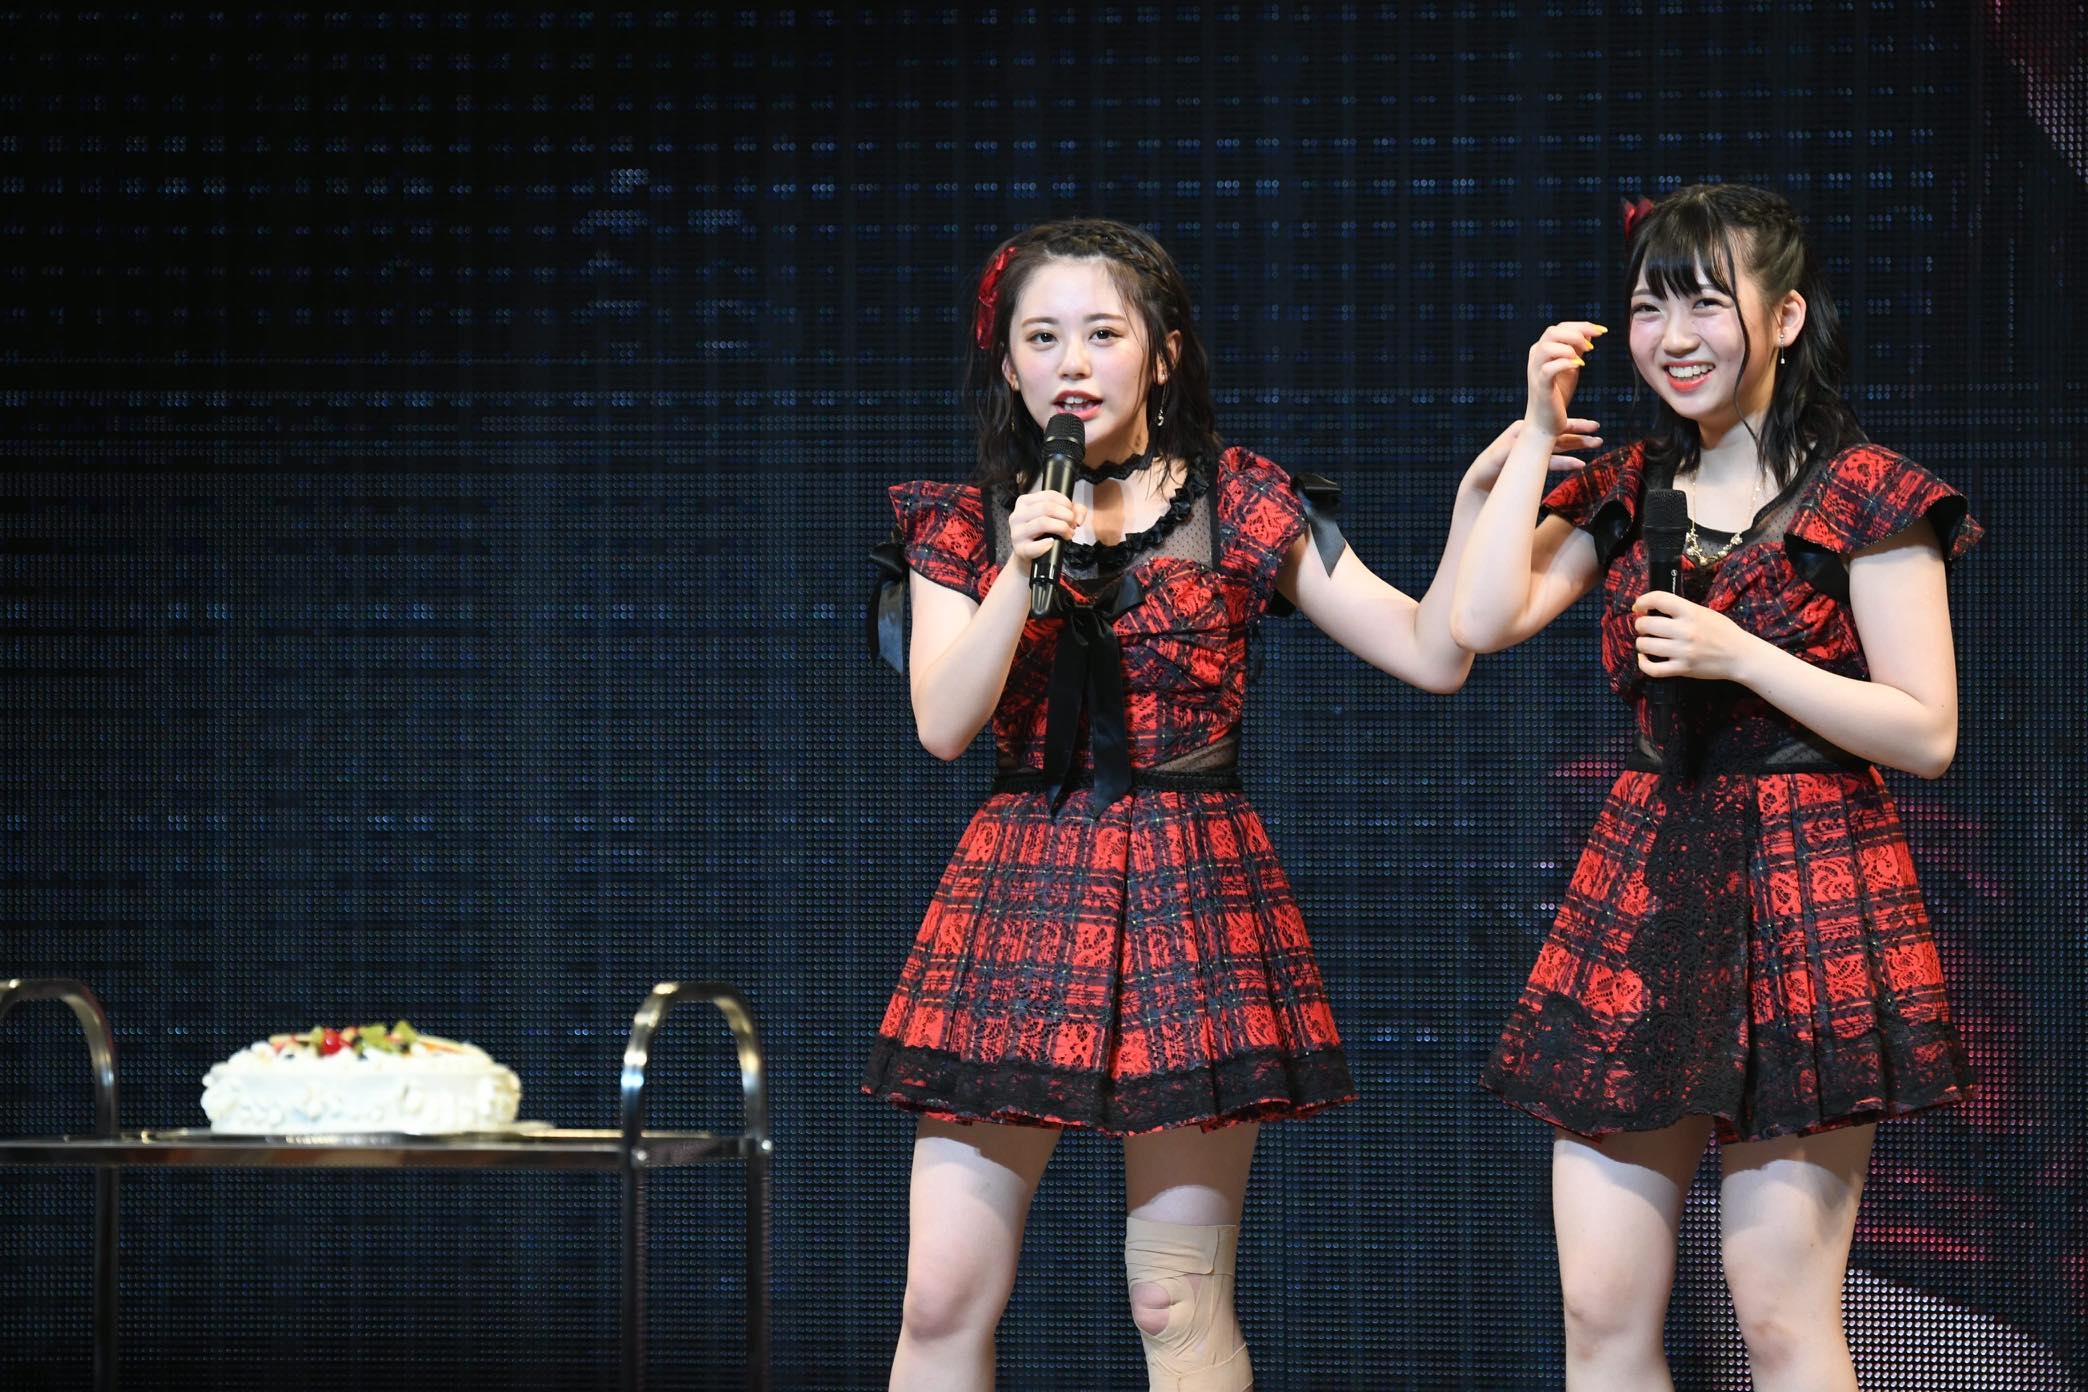 AKB48全国ツアー「神奈川公演」開催、チームBとチーム4のパワーが炸裂!【写真17枚】の画像014